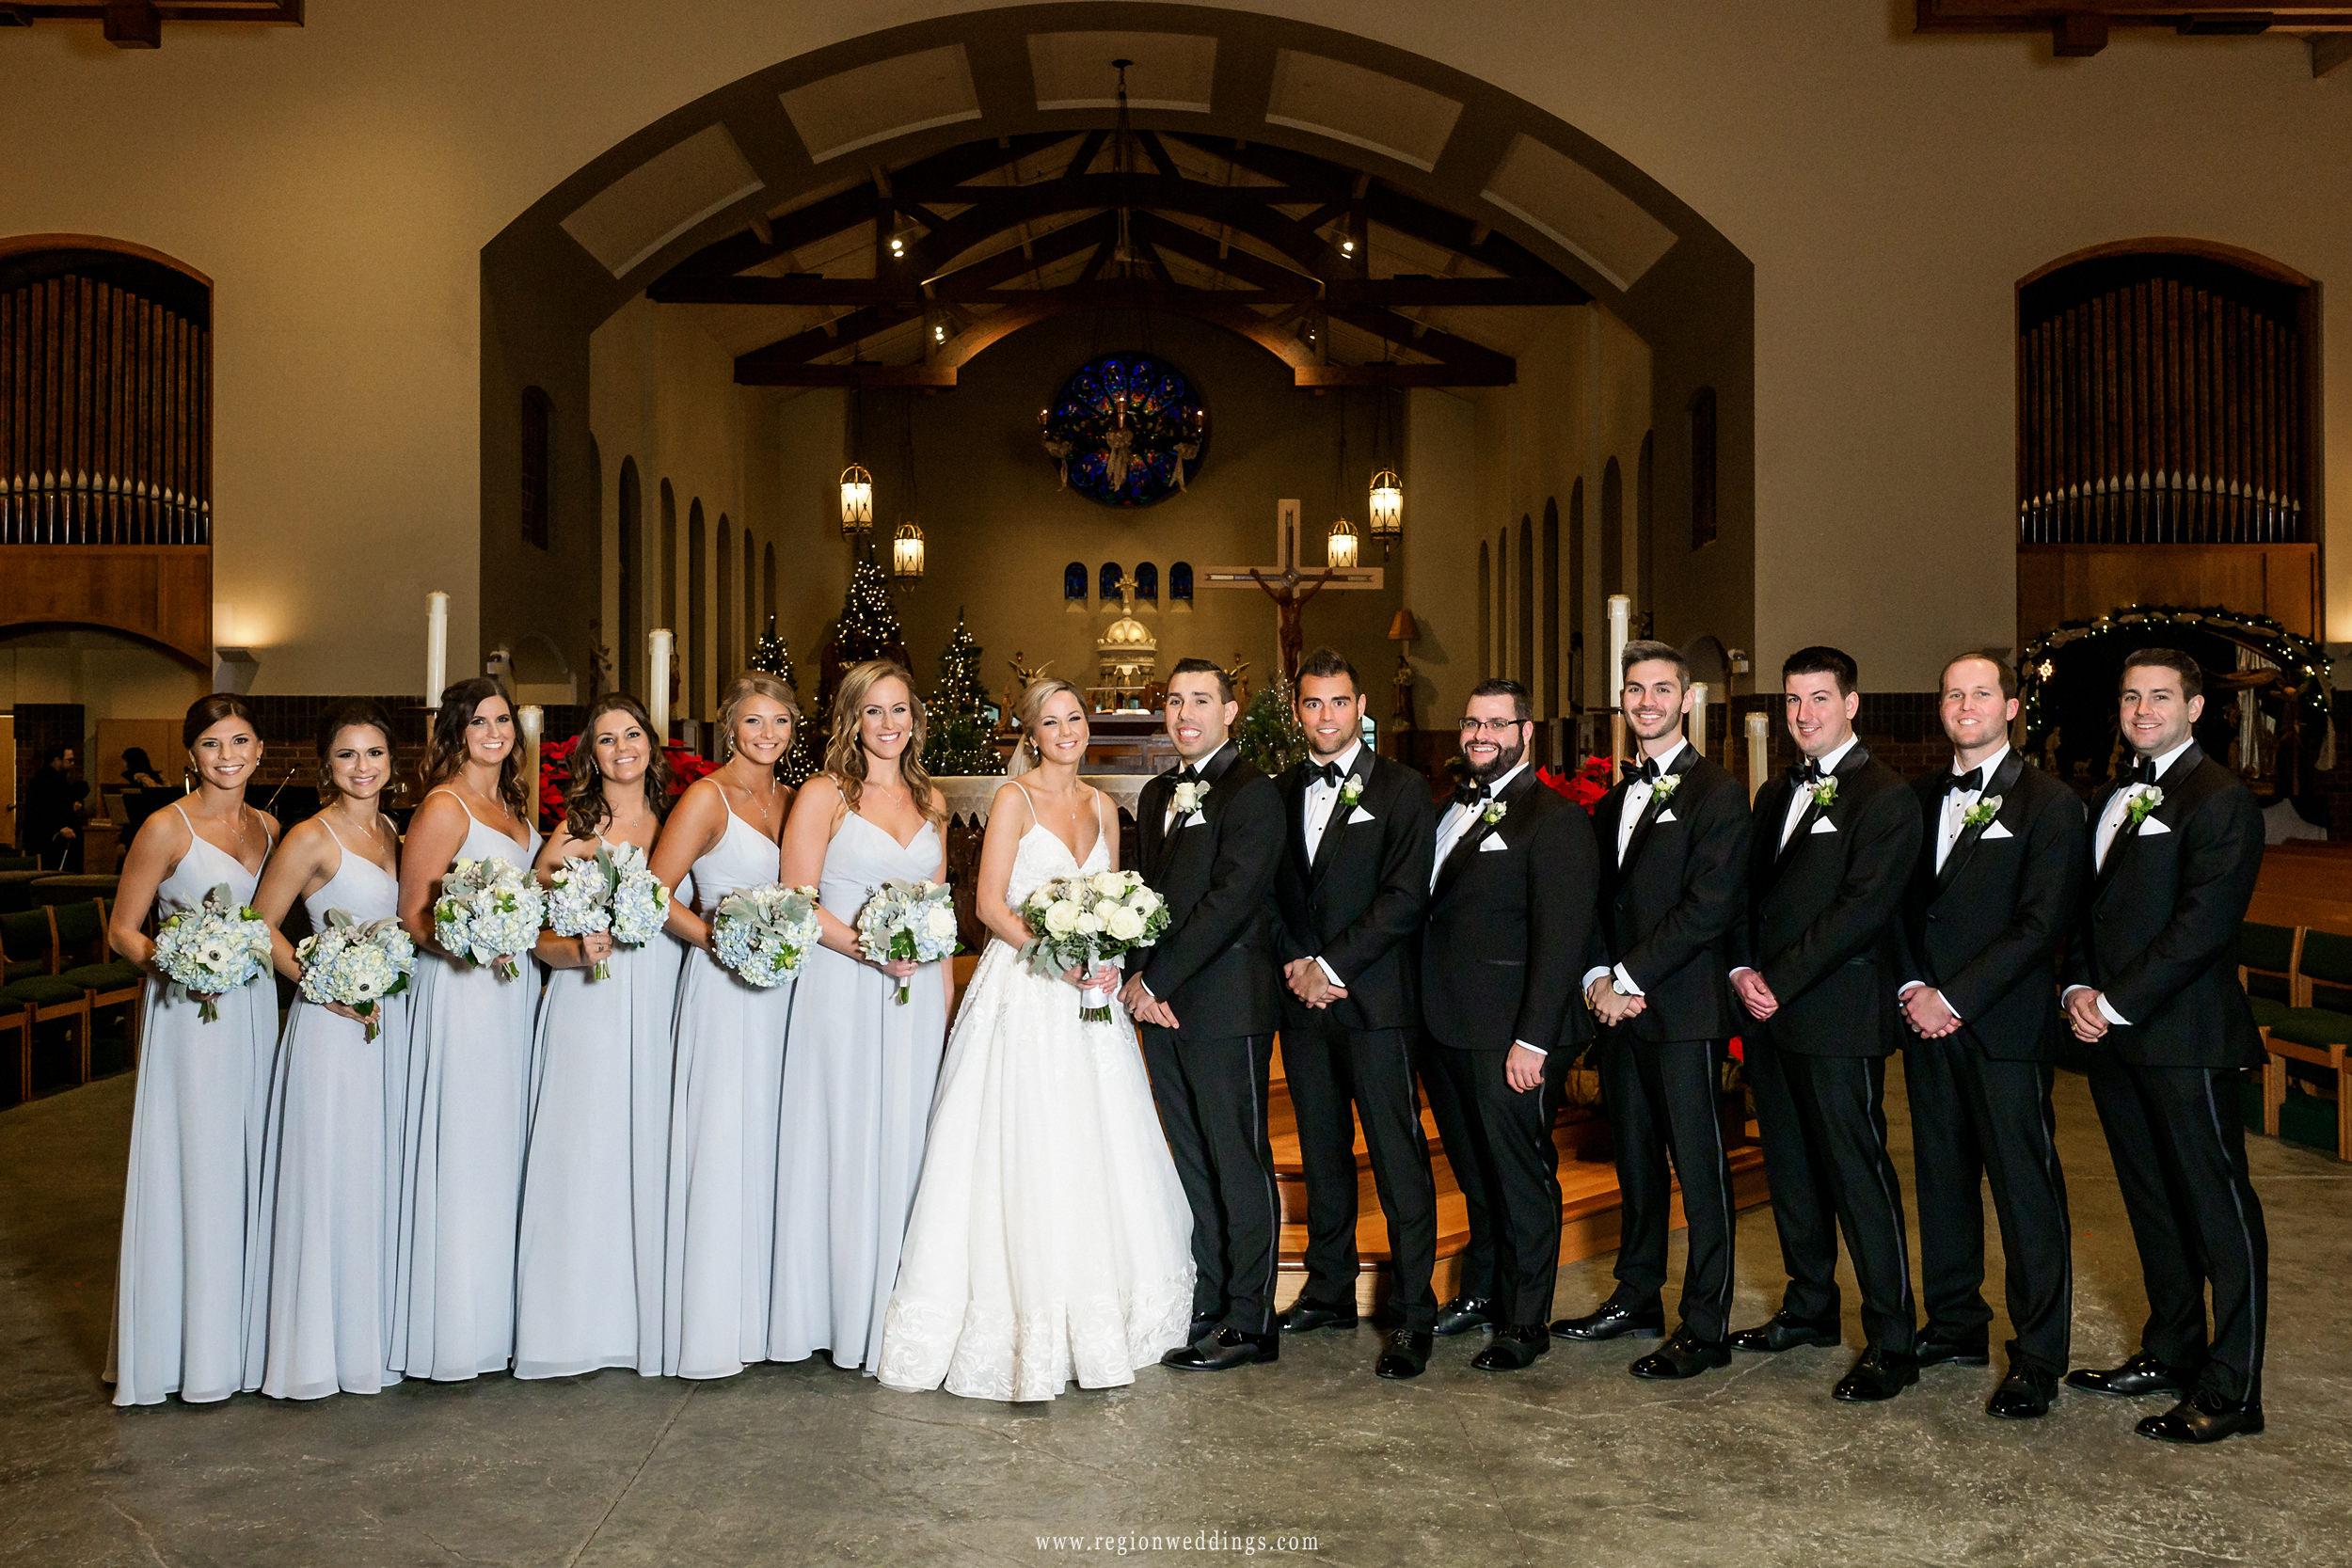 Wedding party group photo at St. Michael's Parish.